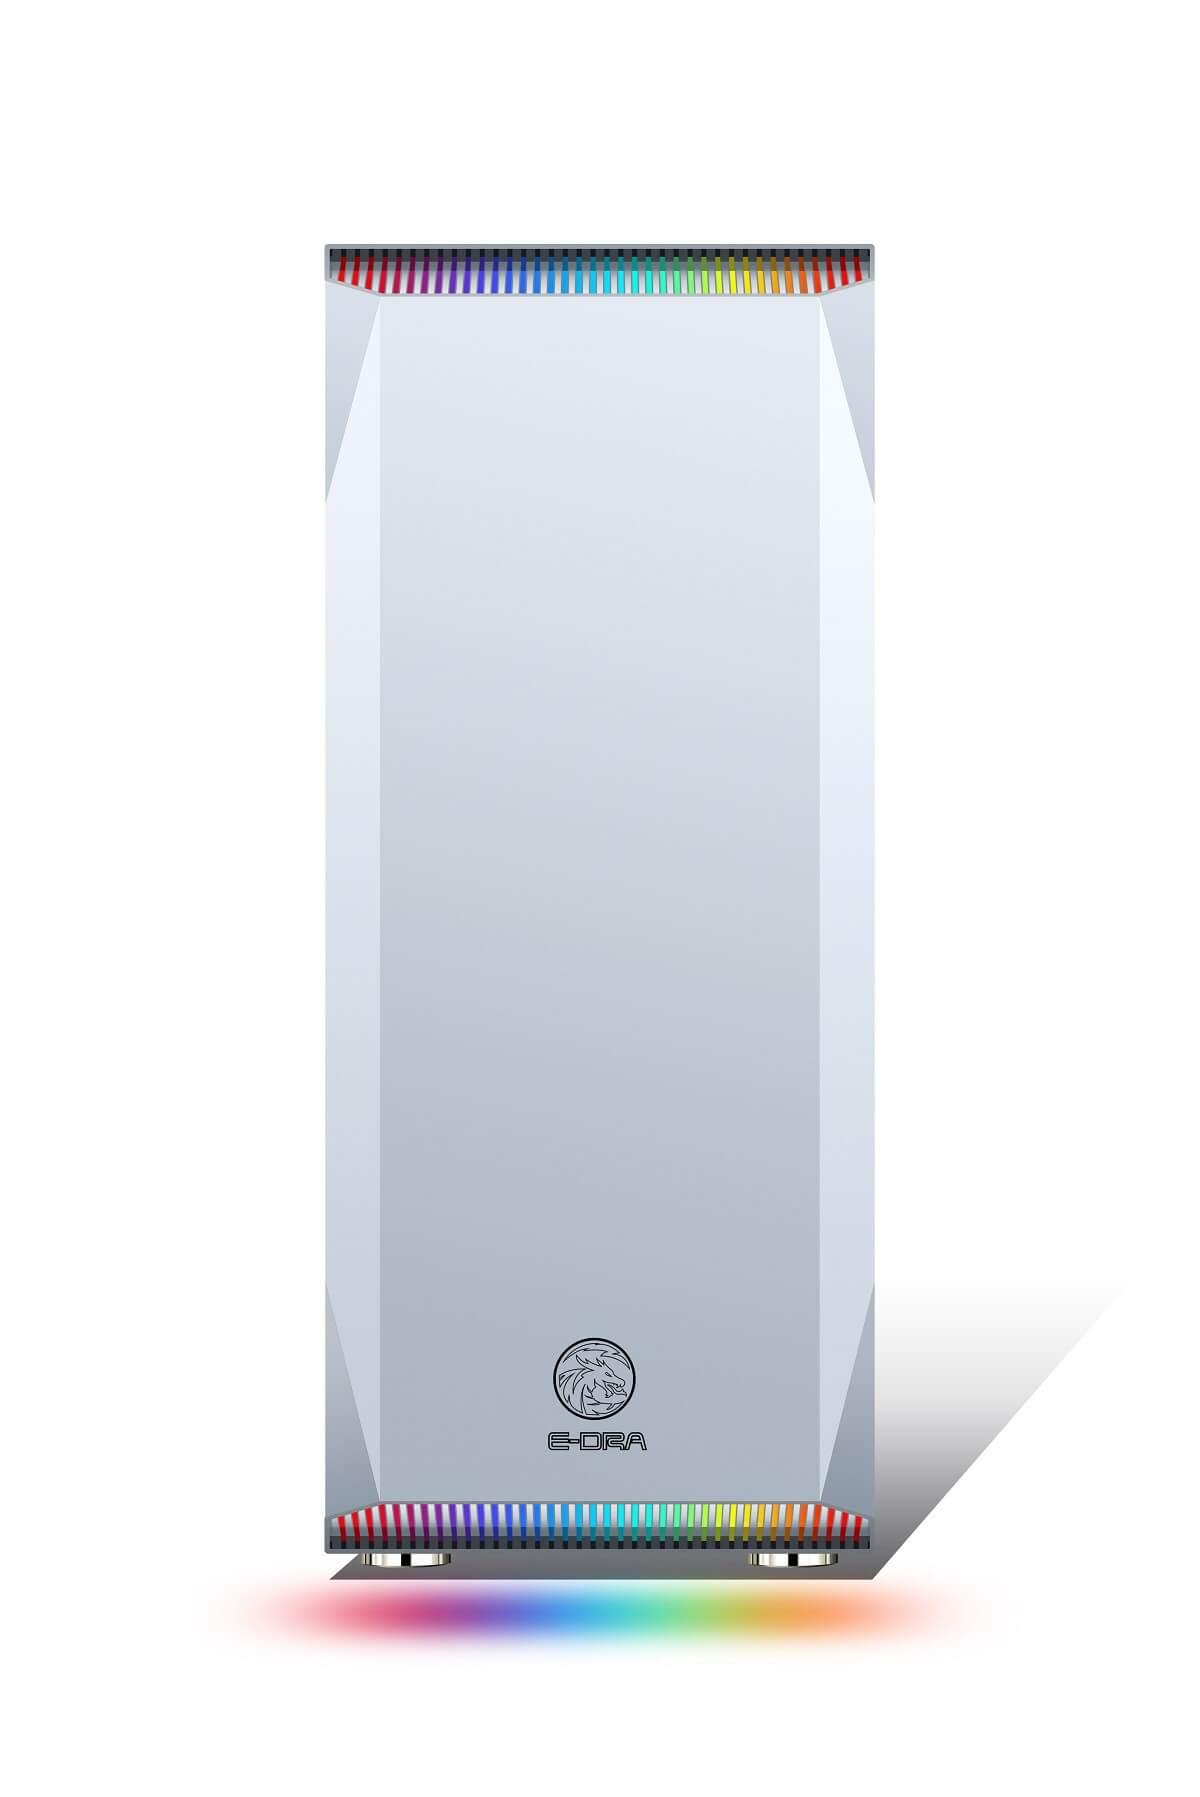 Case AZGAMER Shadow Phoenix  White H310 & I5 9400F